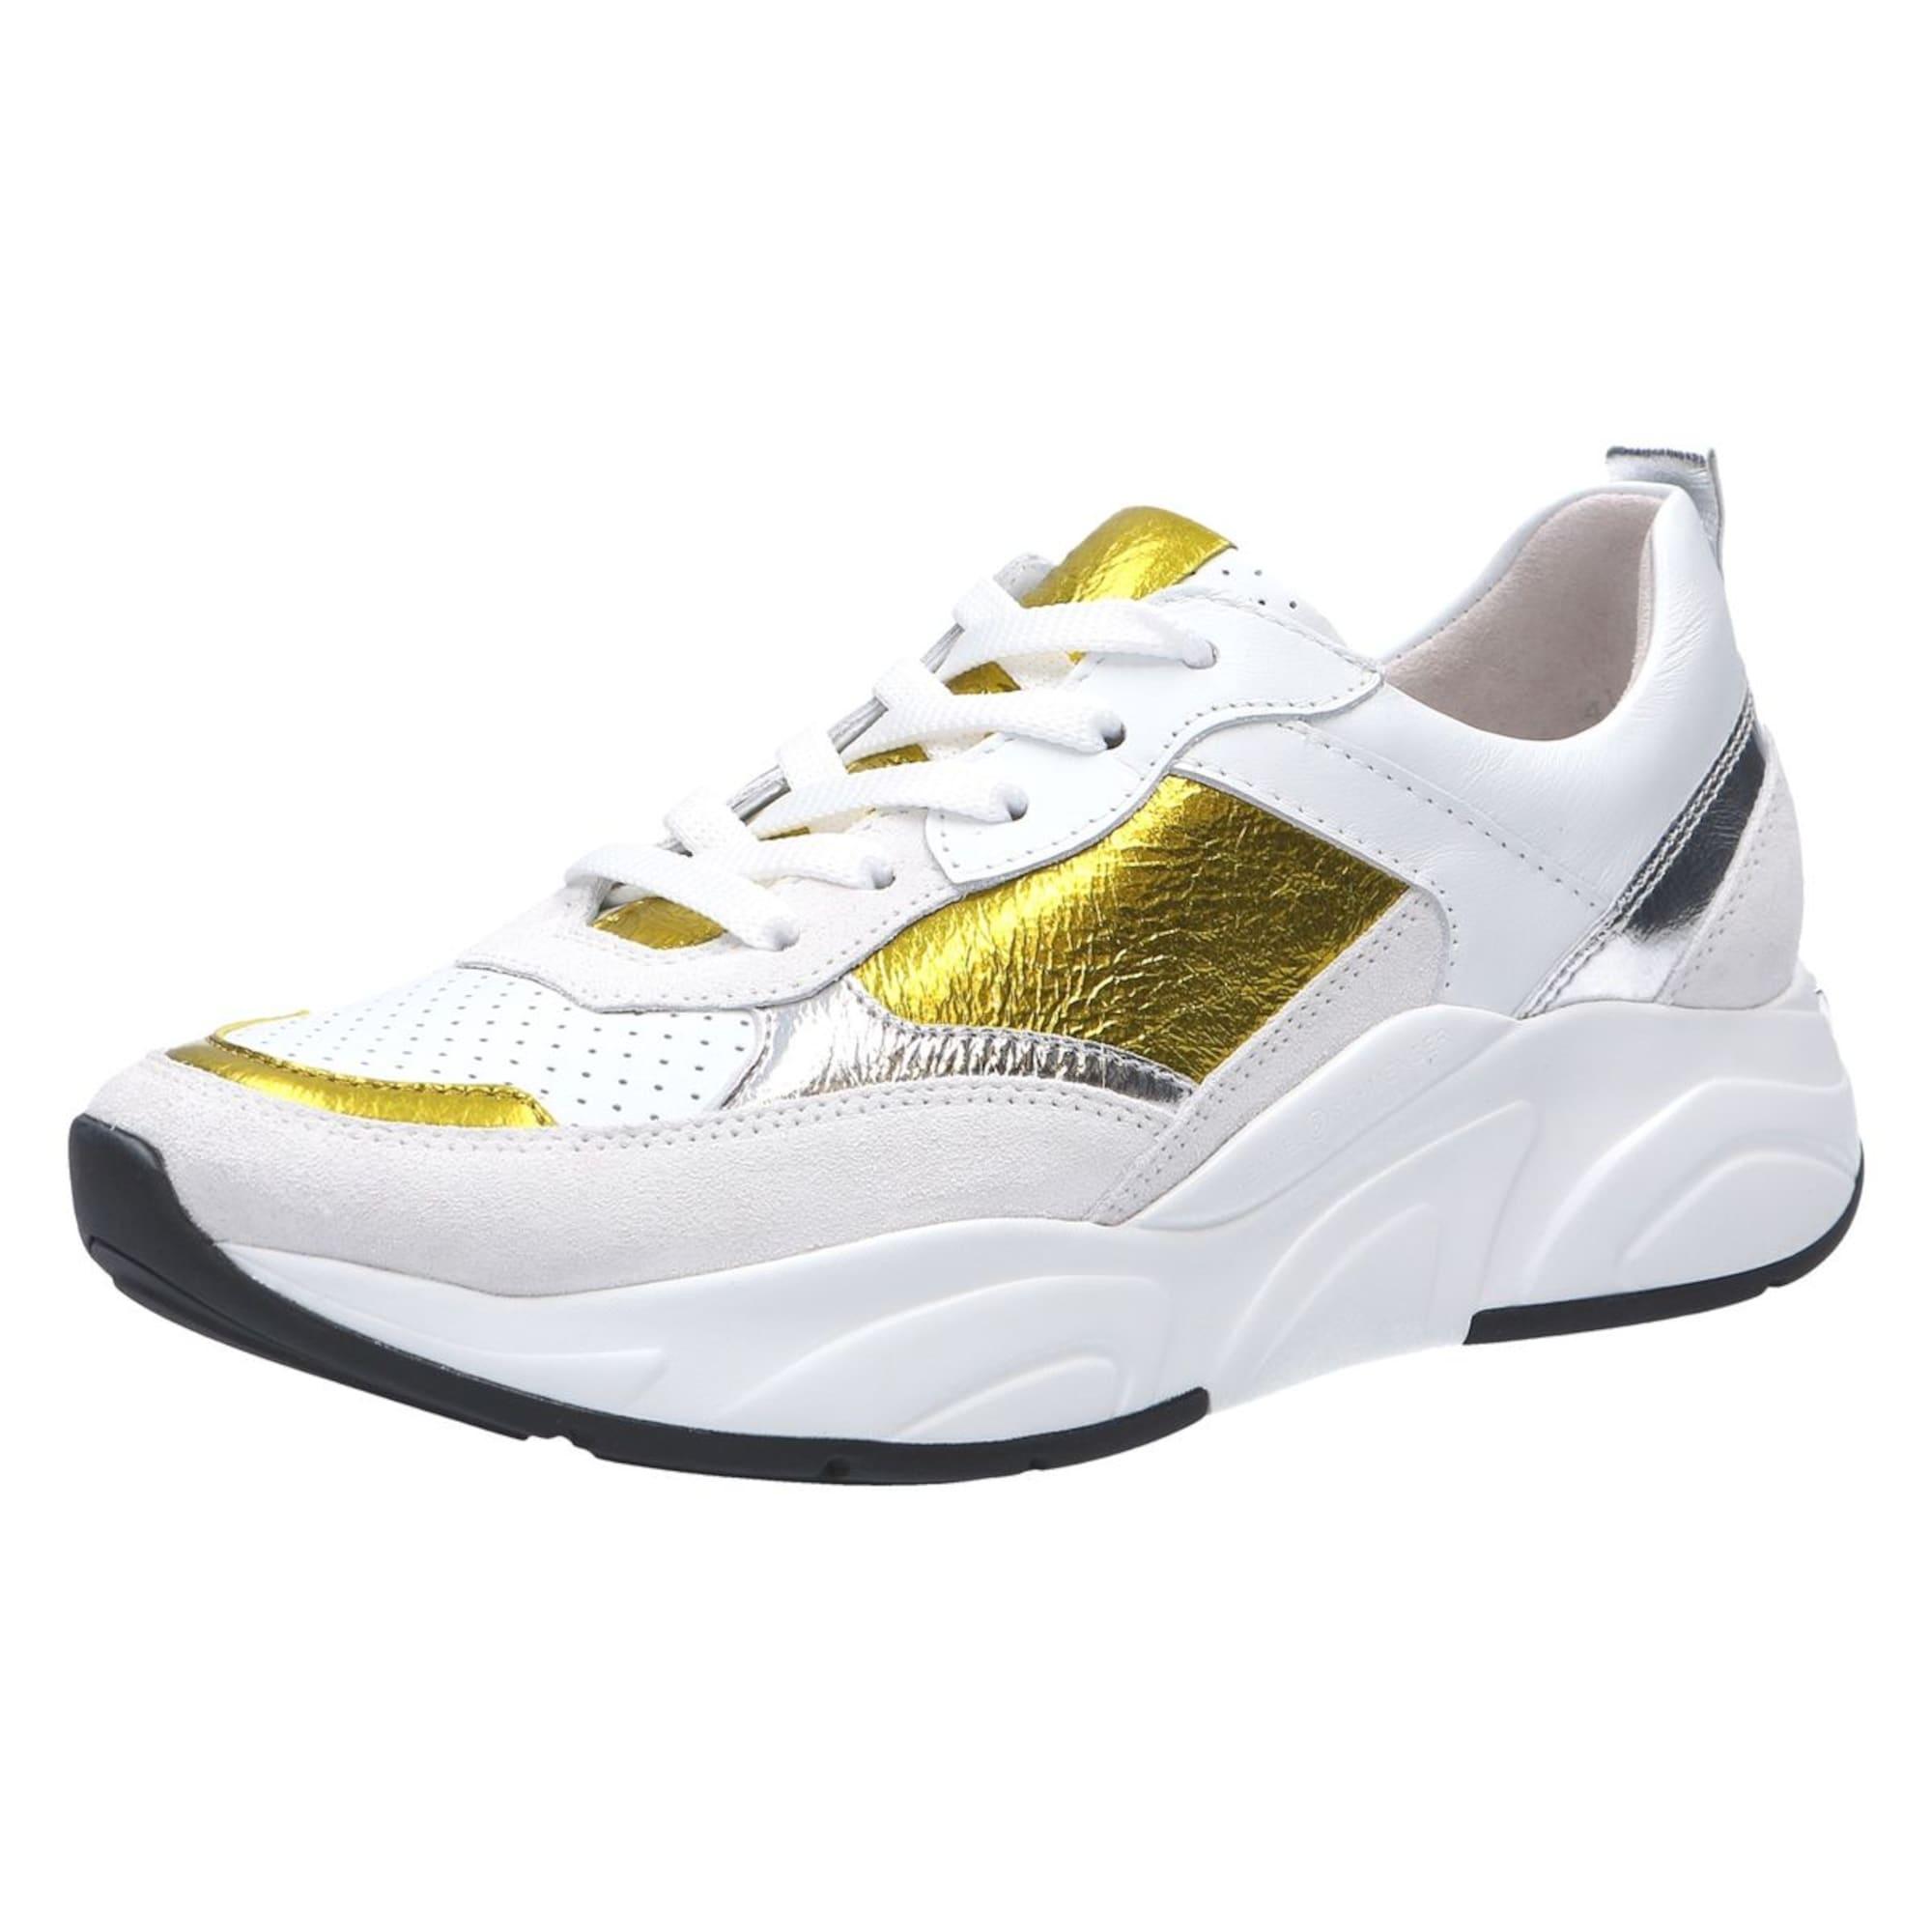 Tenisky Ultra zlatá stříbrná bílá Kennel & Schmenger